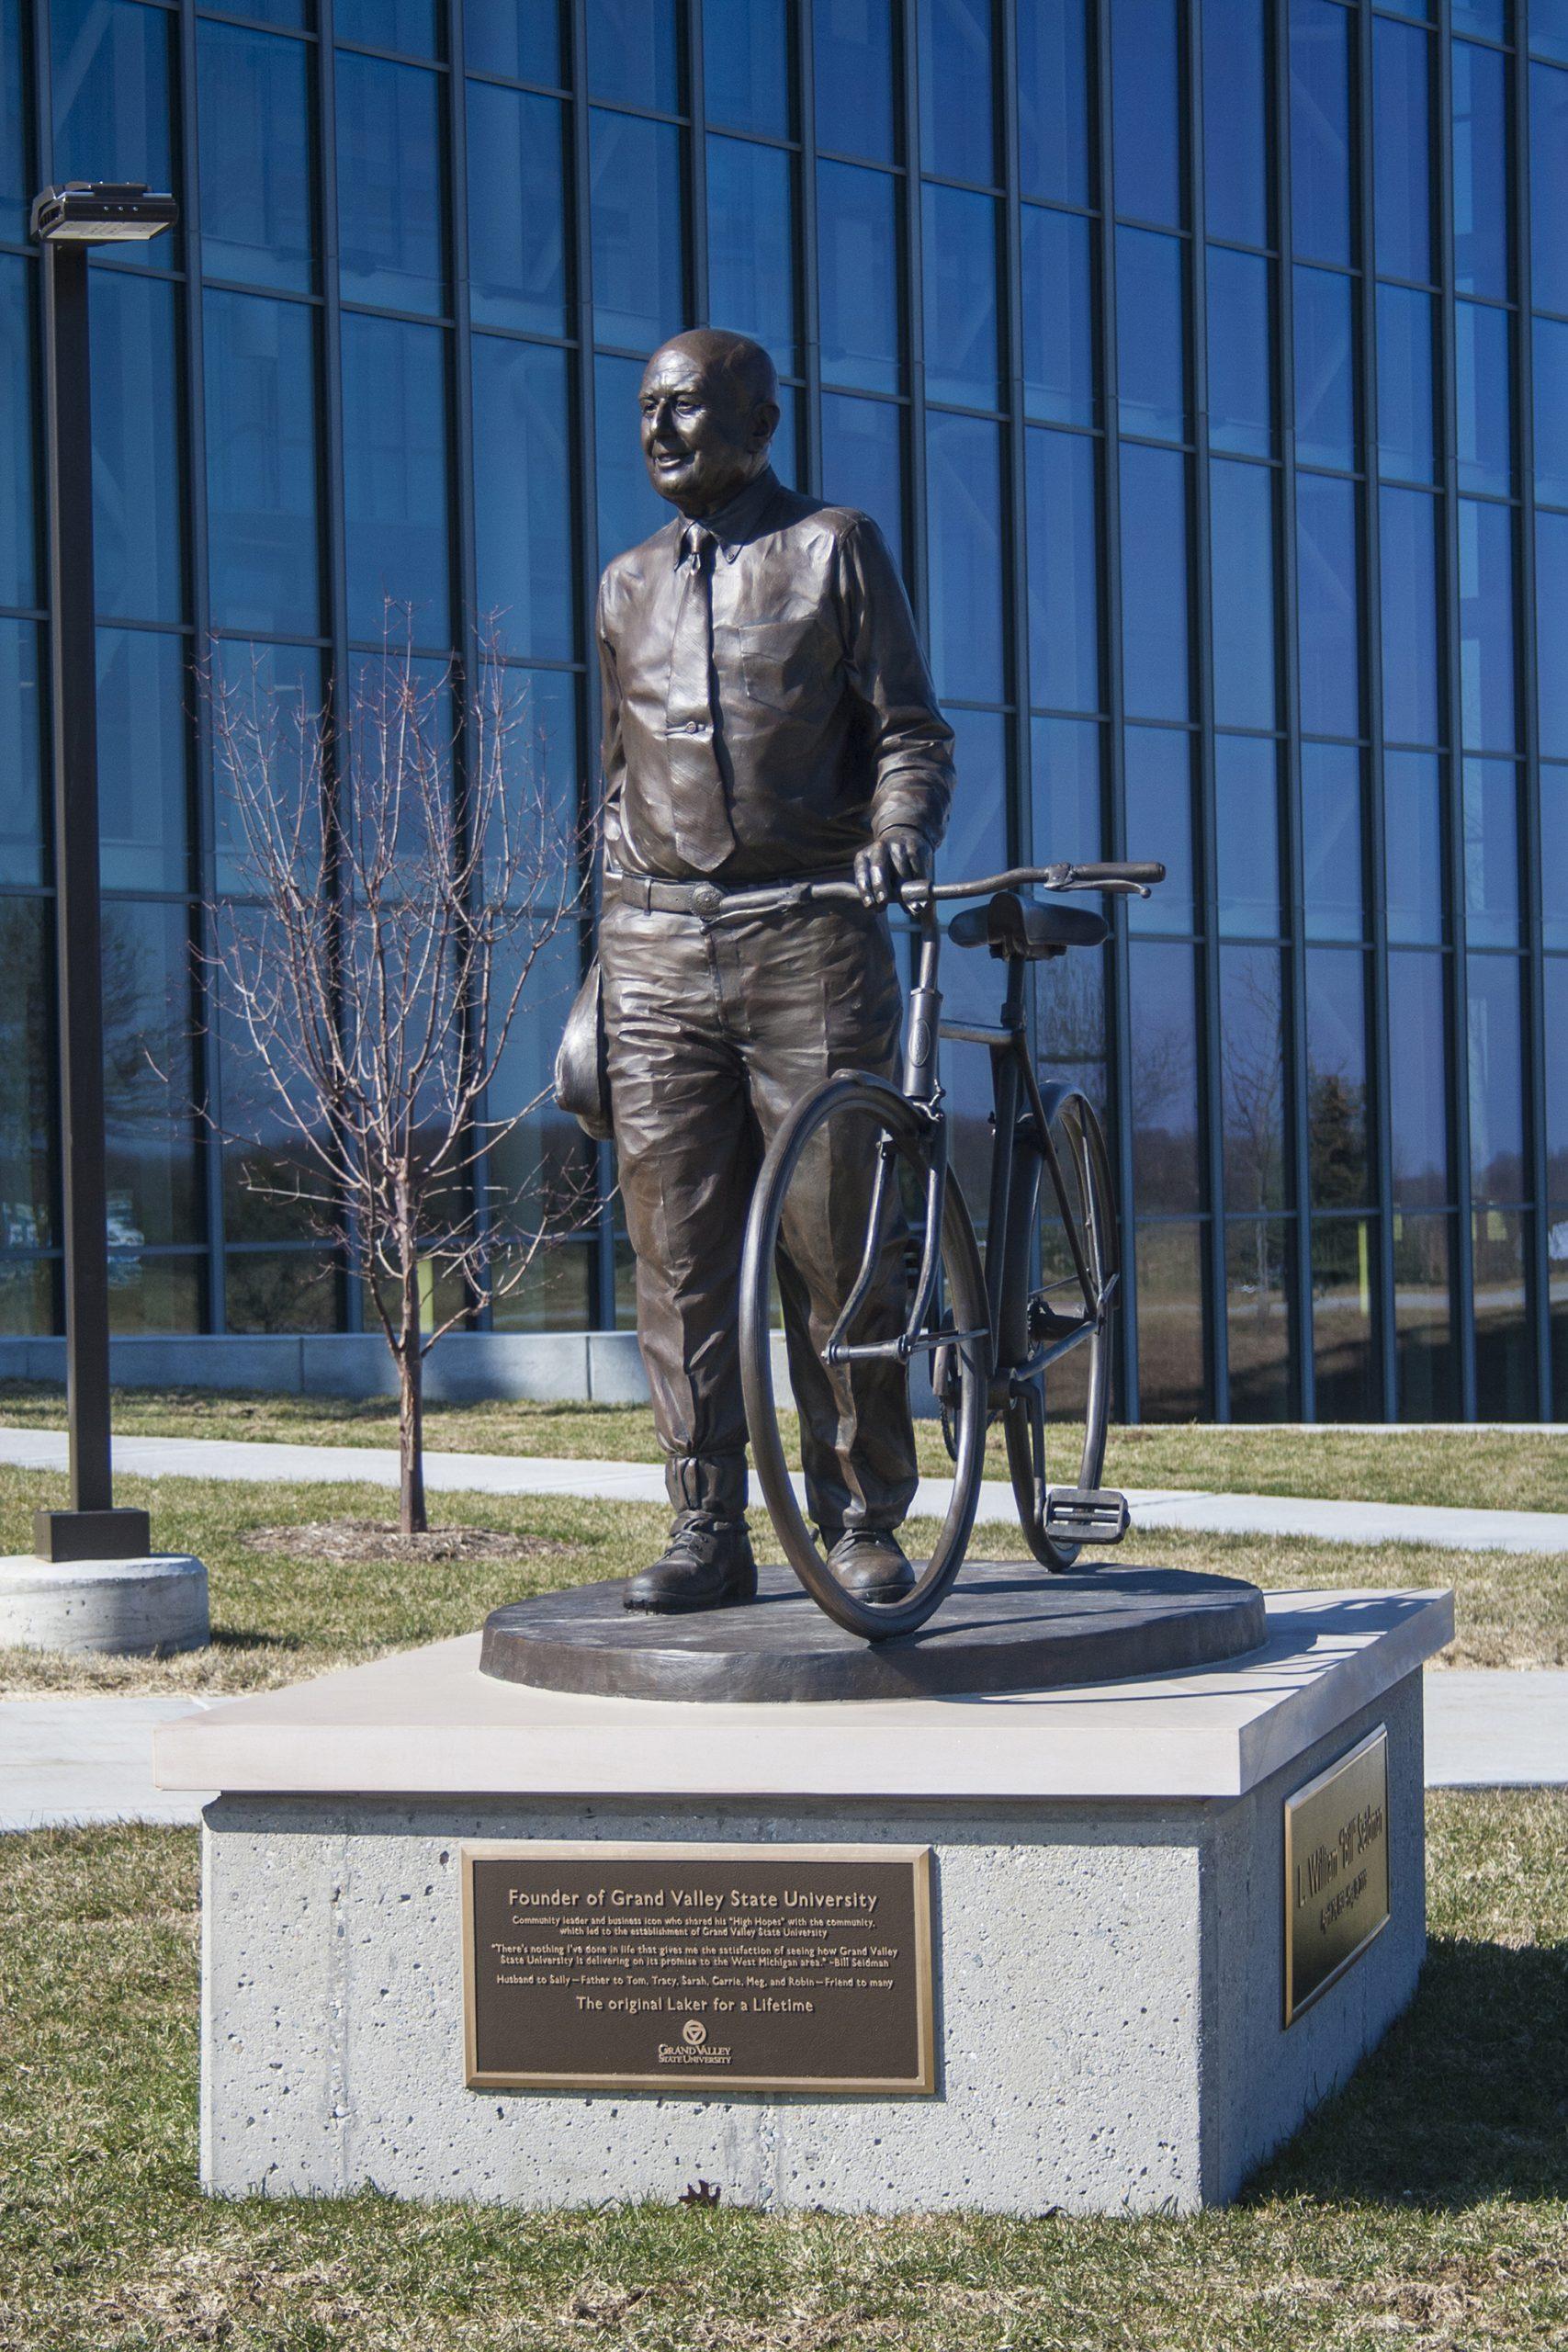 L. WiIlliam Seidman Memorial